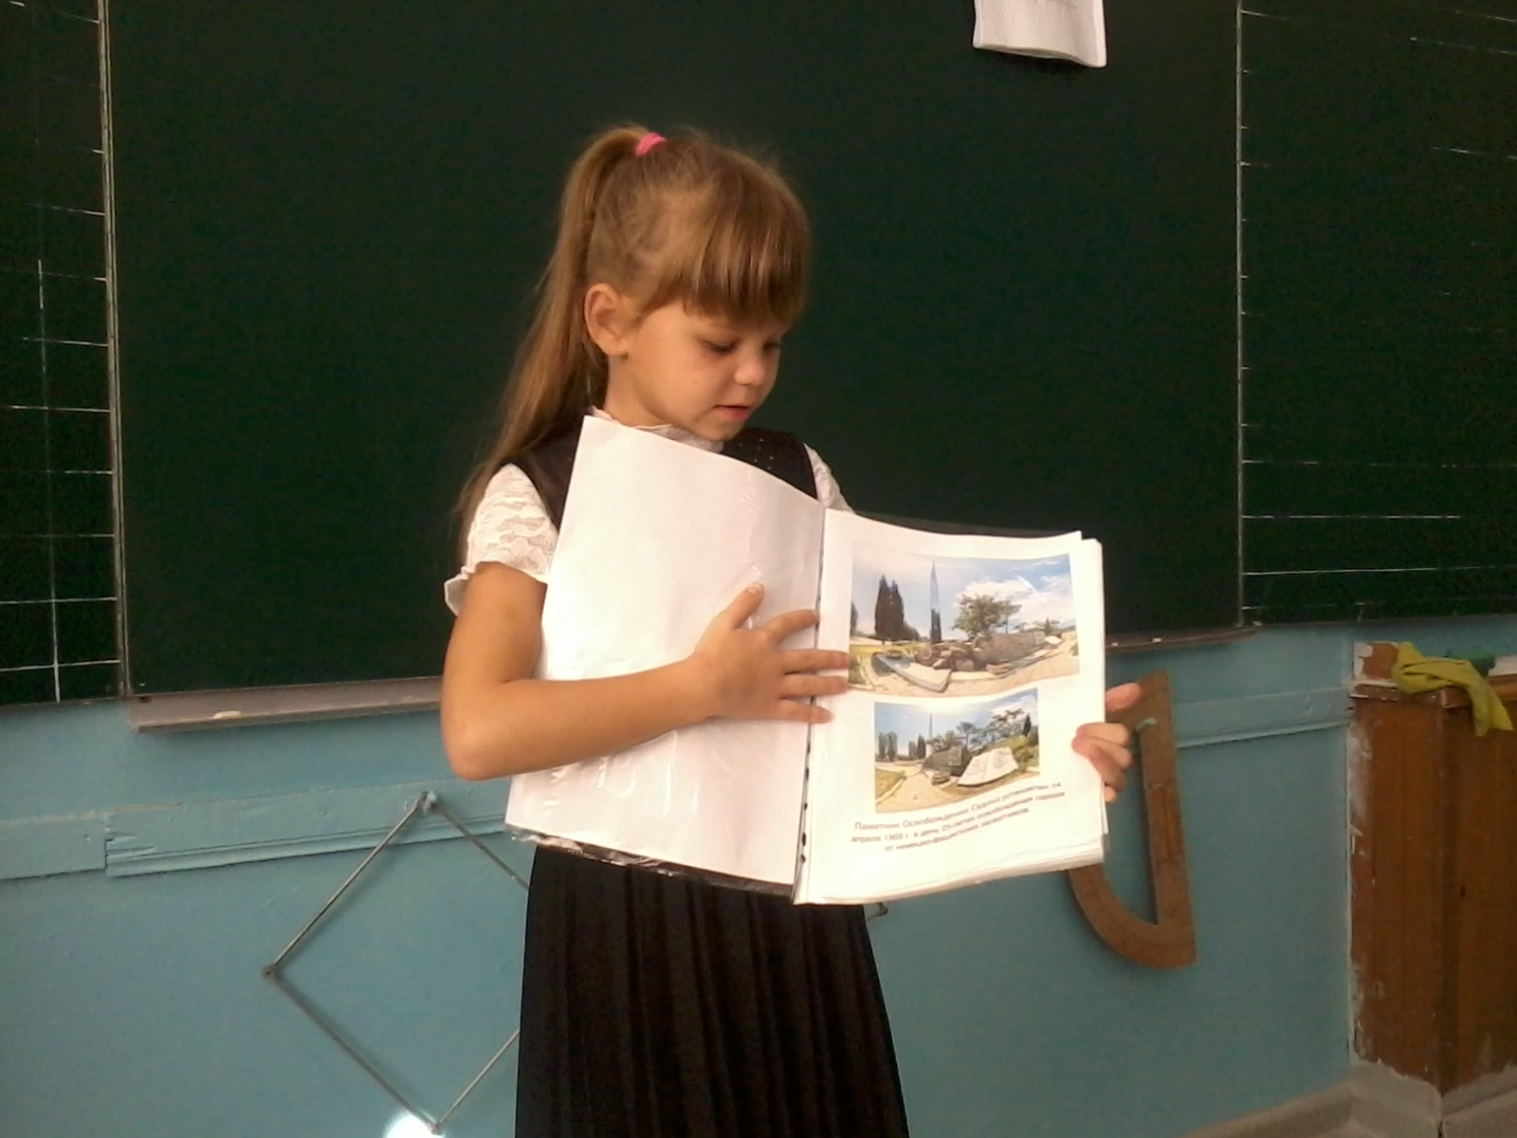 G:\фото школа\2014-09-29 09.51.28.jpg